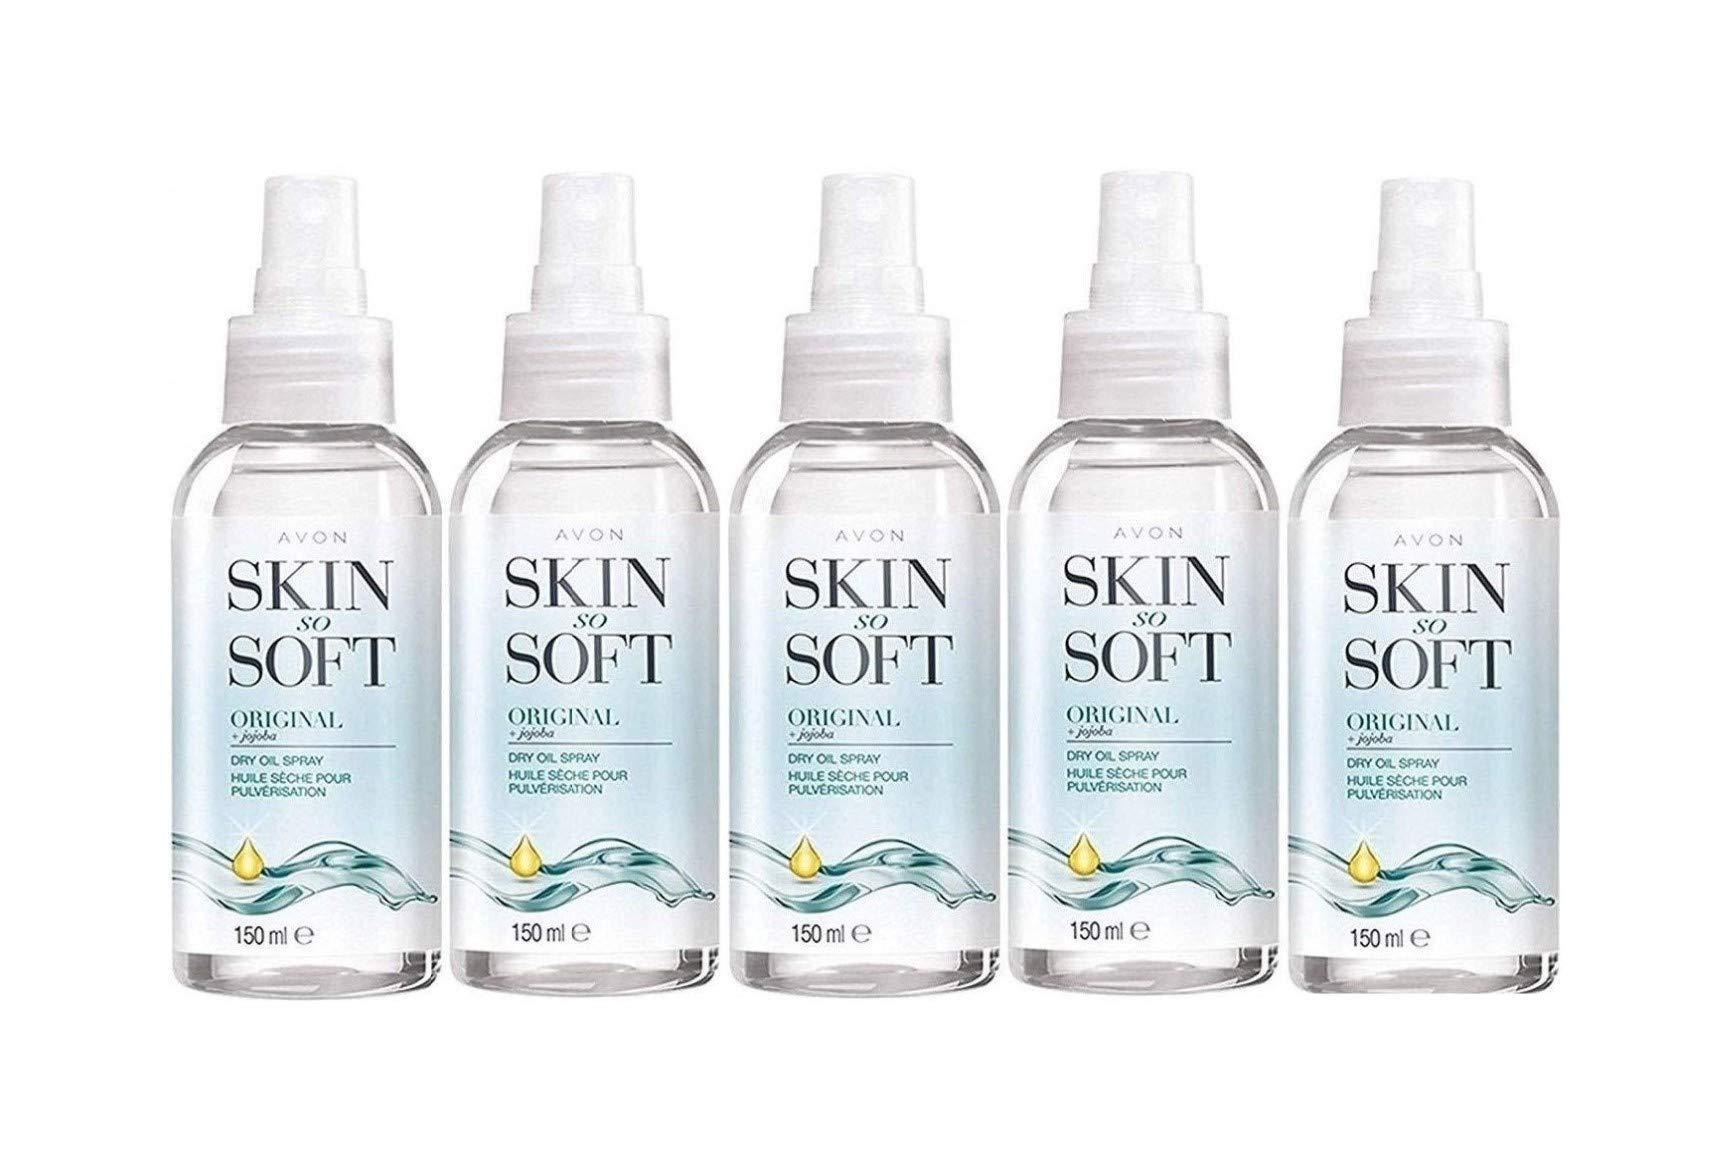 Avon Skin So Soft Original Dry Oil Body Spray 150 ml - Pack of 5